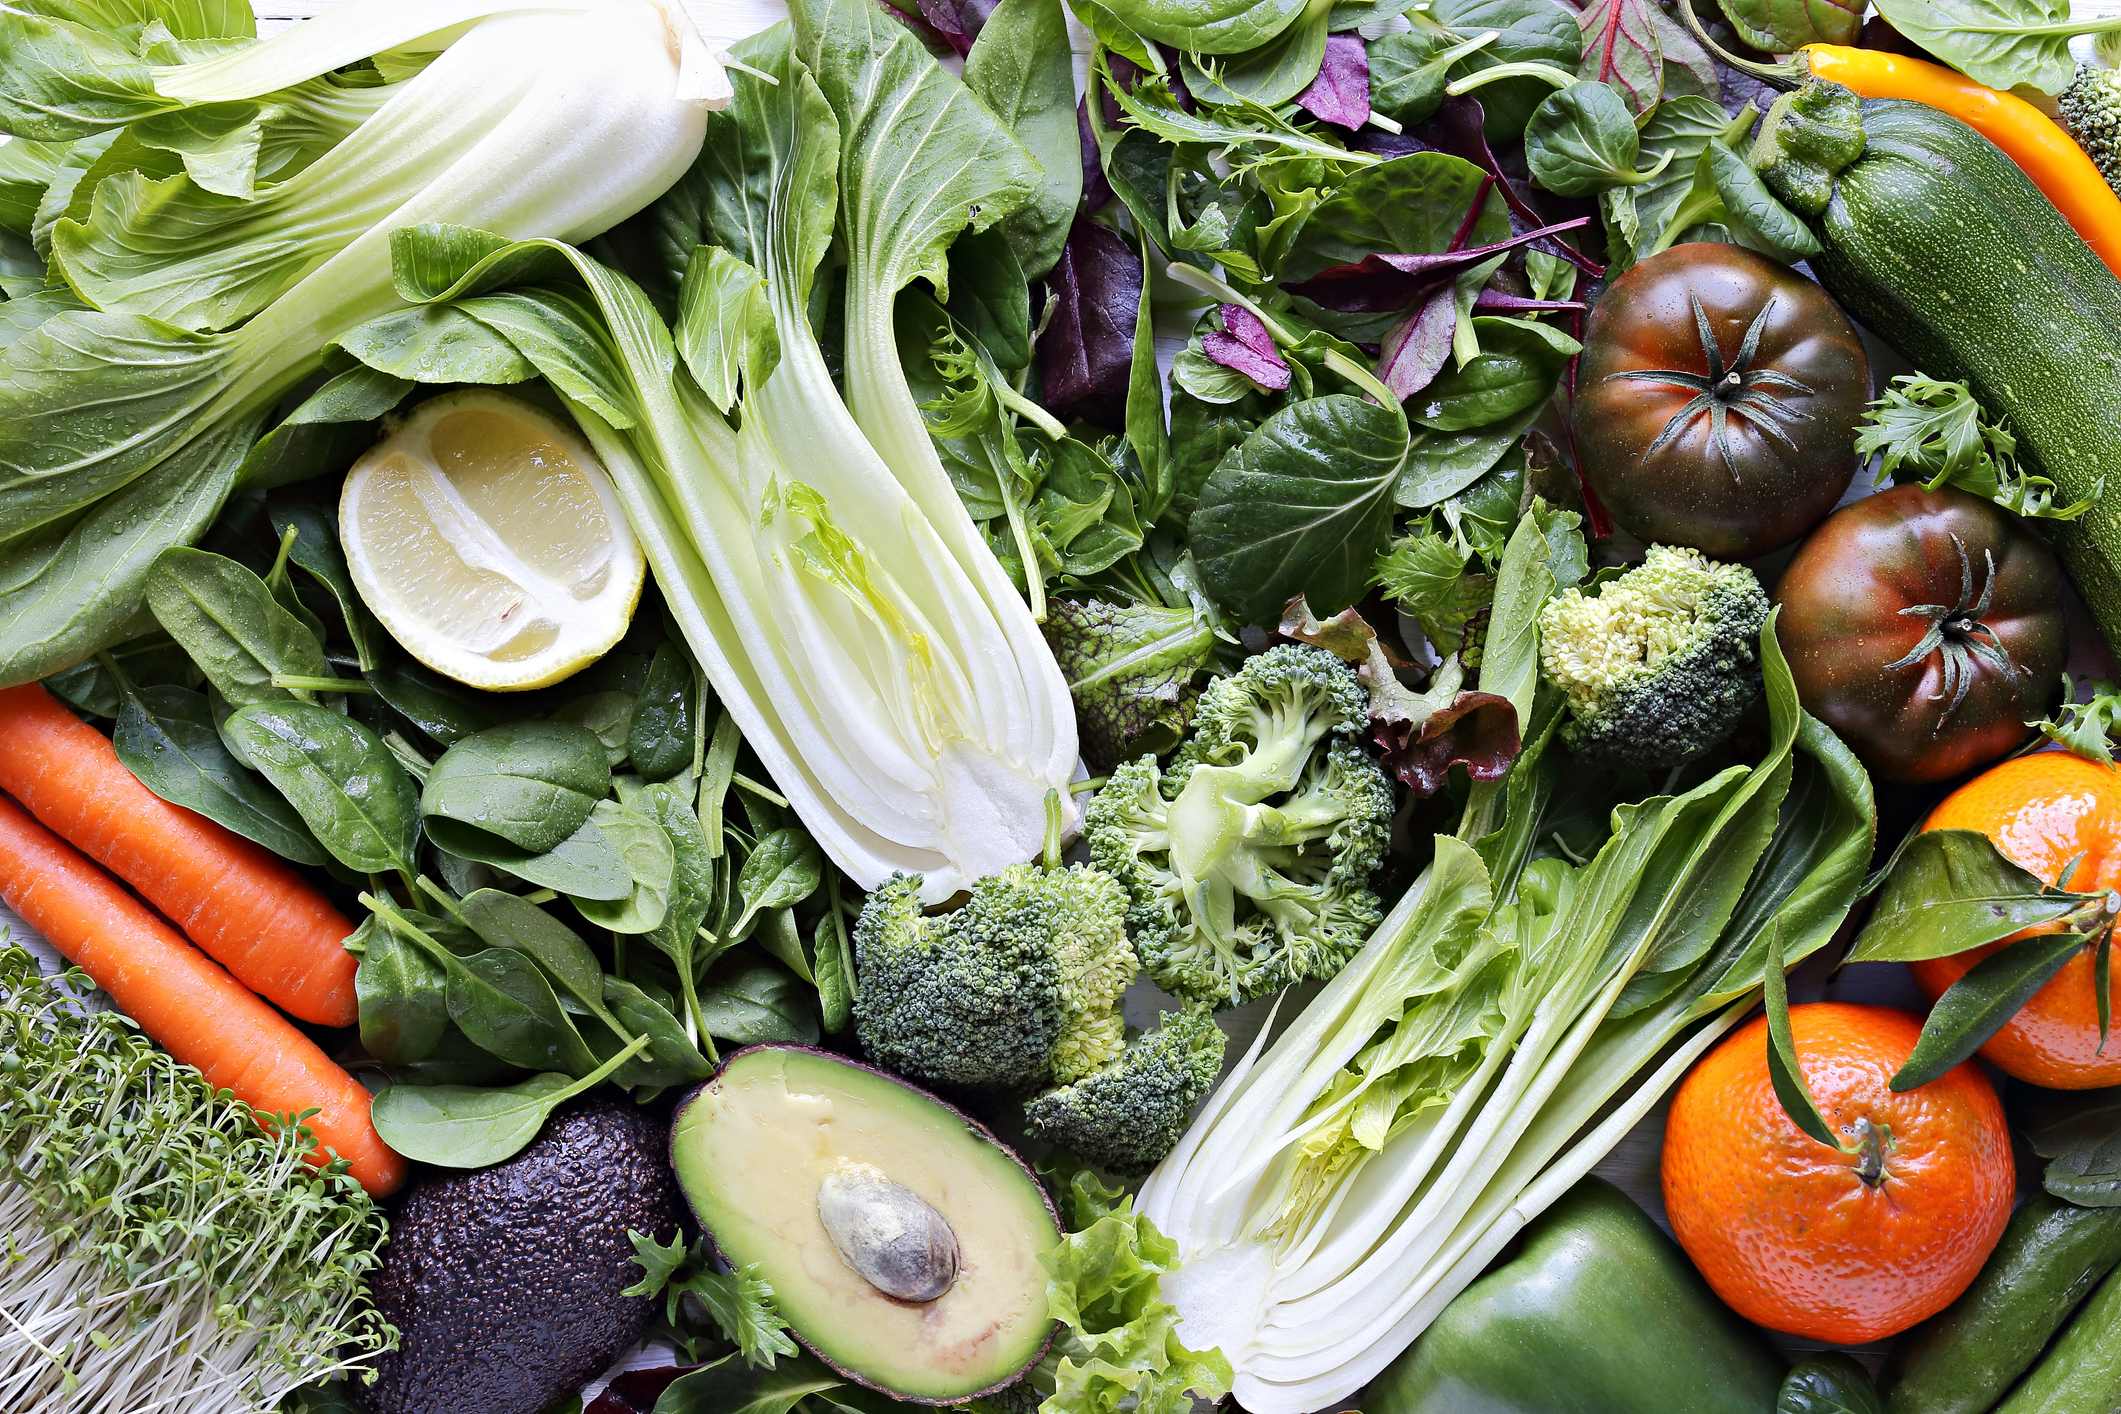 Healthy plant foods. Image credit: iStock